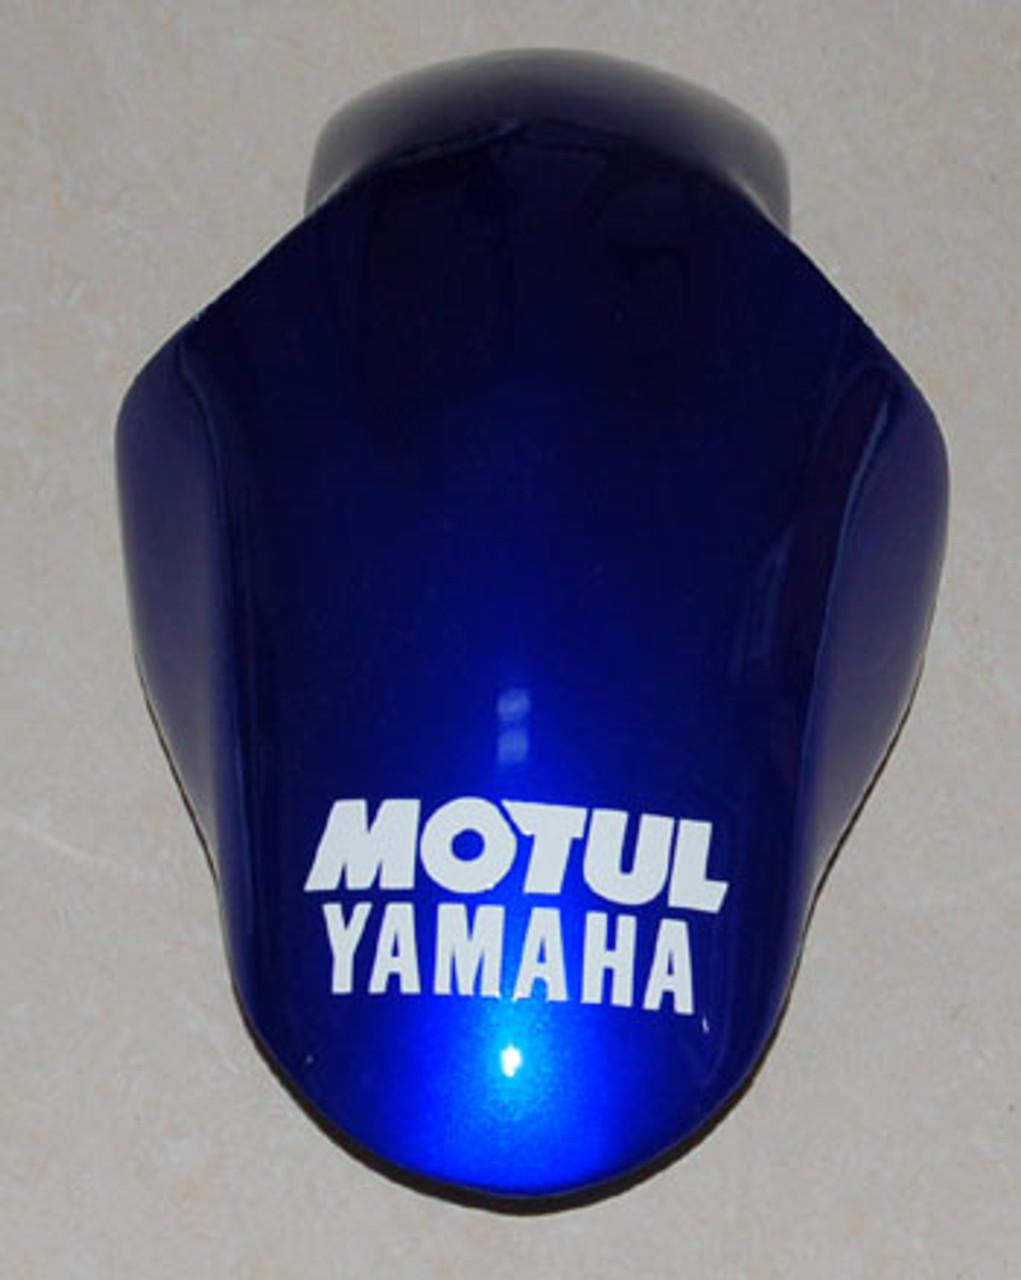 Fairings Yamaha YZF-R6 White & Blue No.46 FIAT R6 Racing (1998-2002)